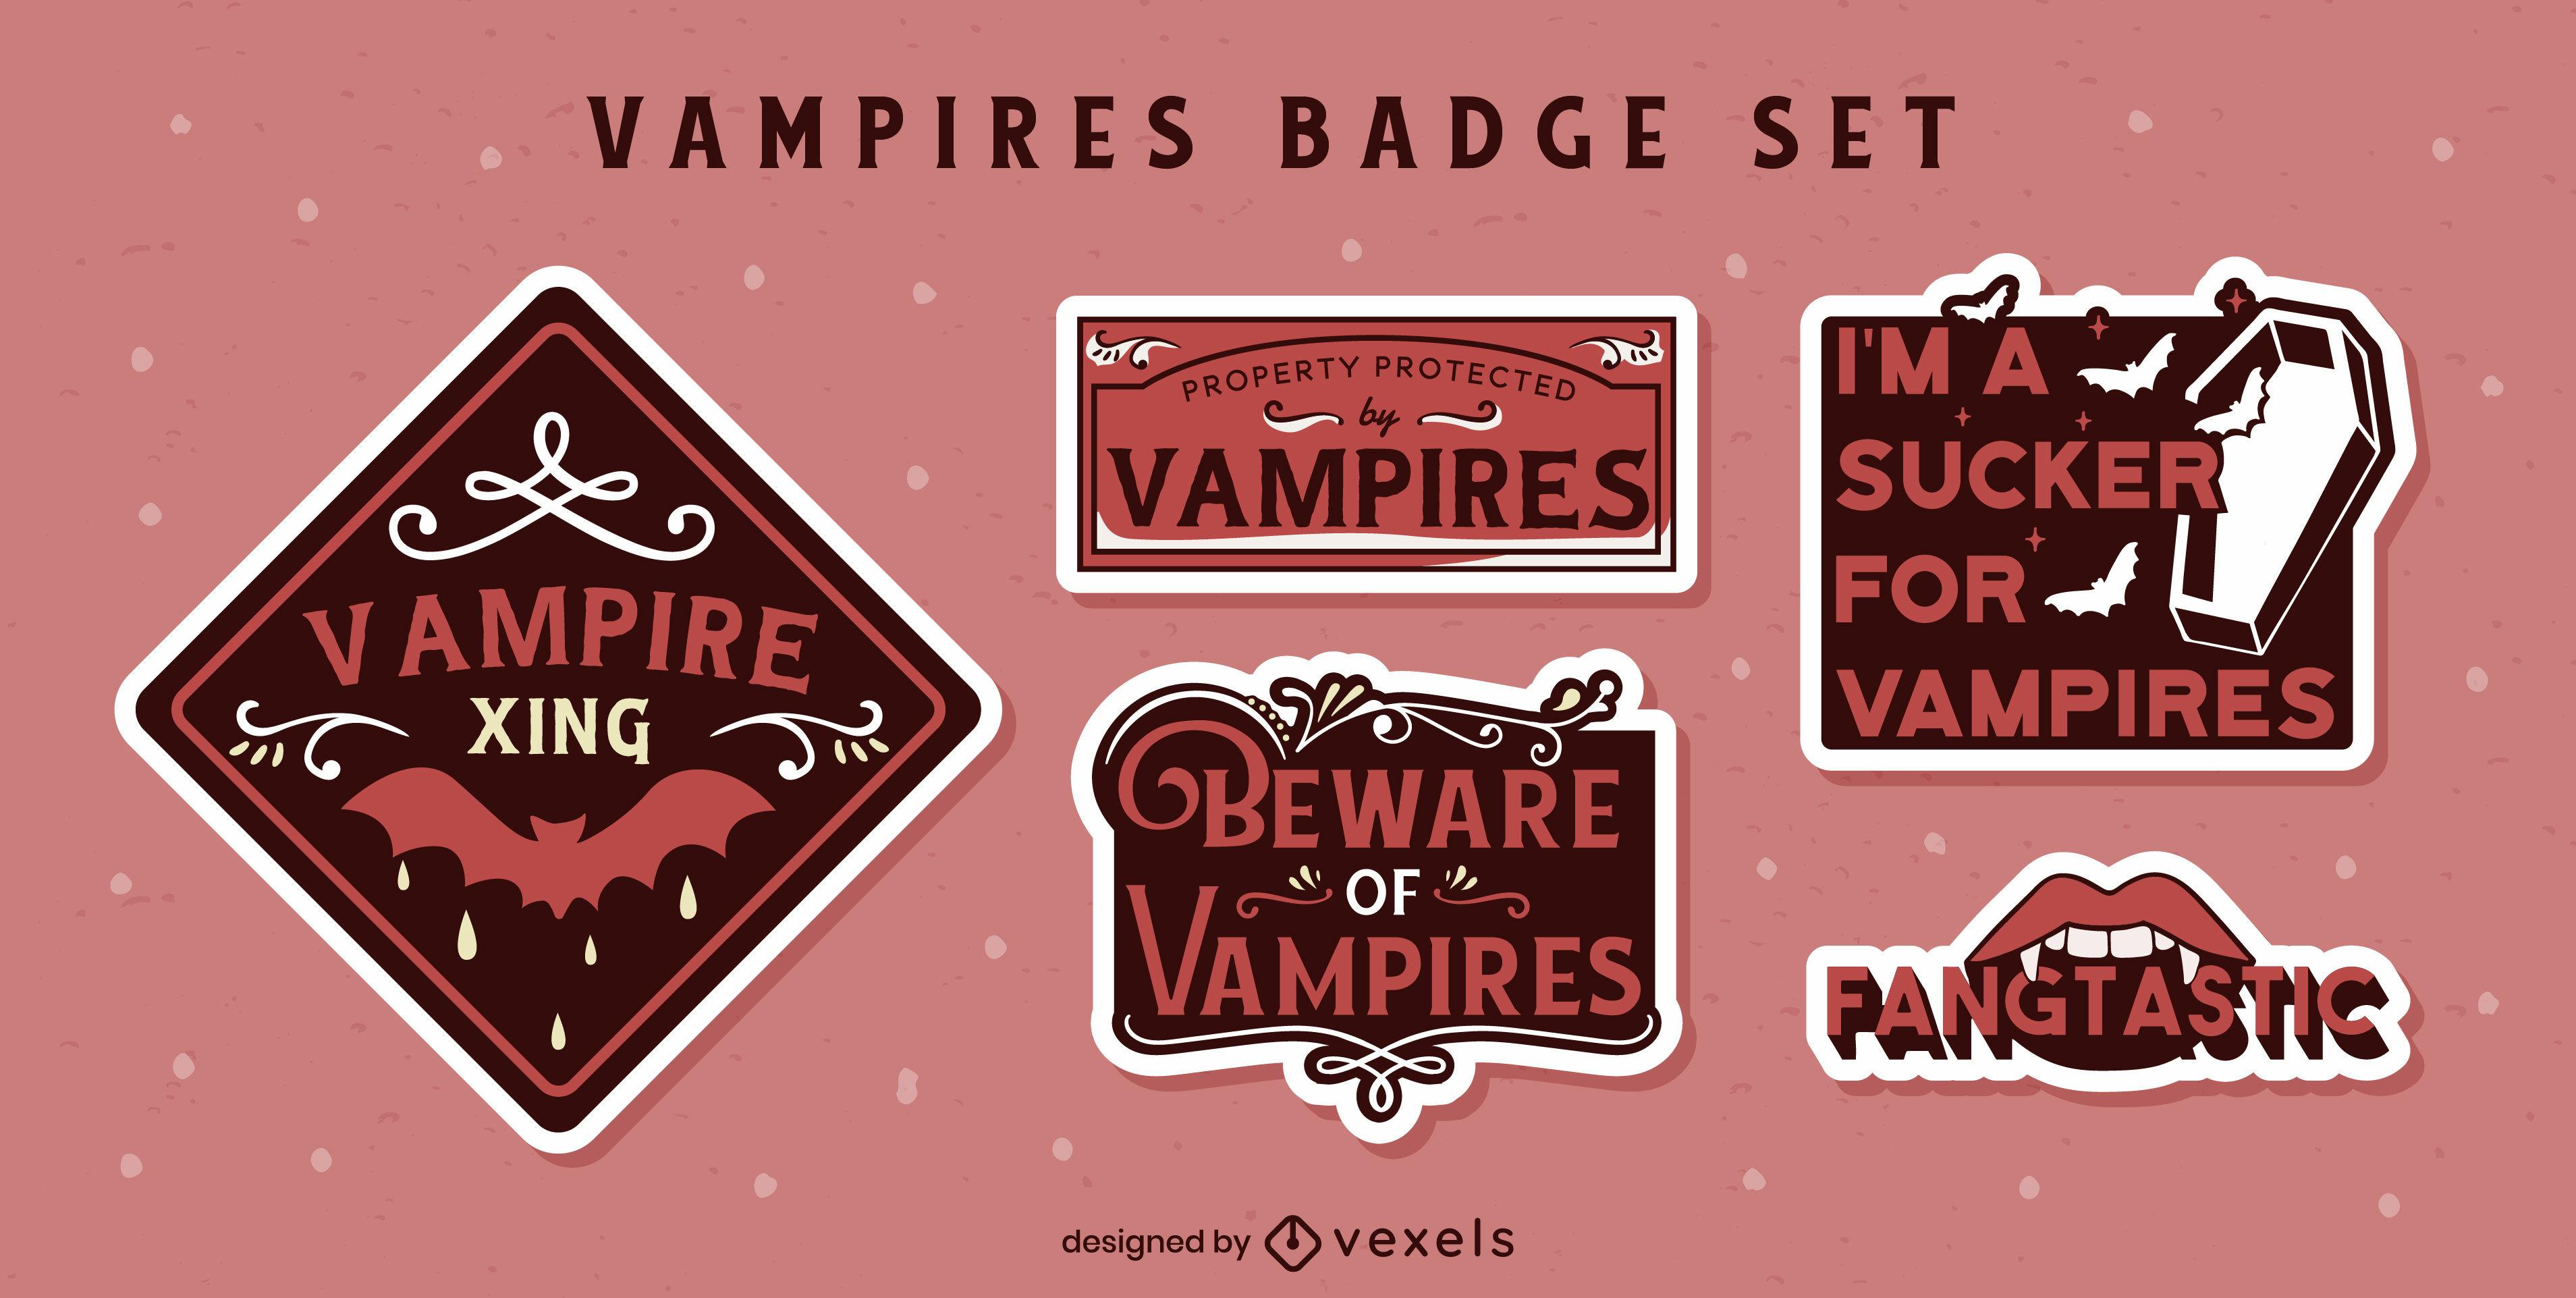 Vampires quotes stickers set